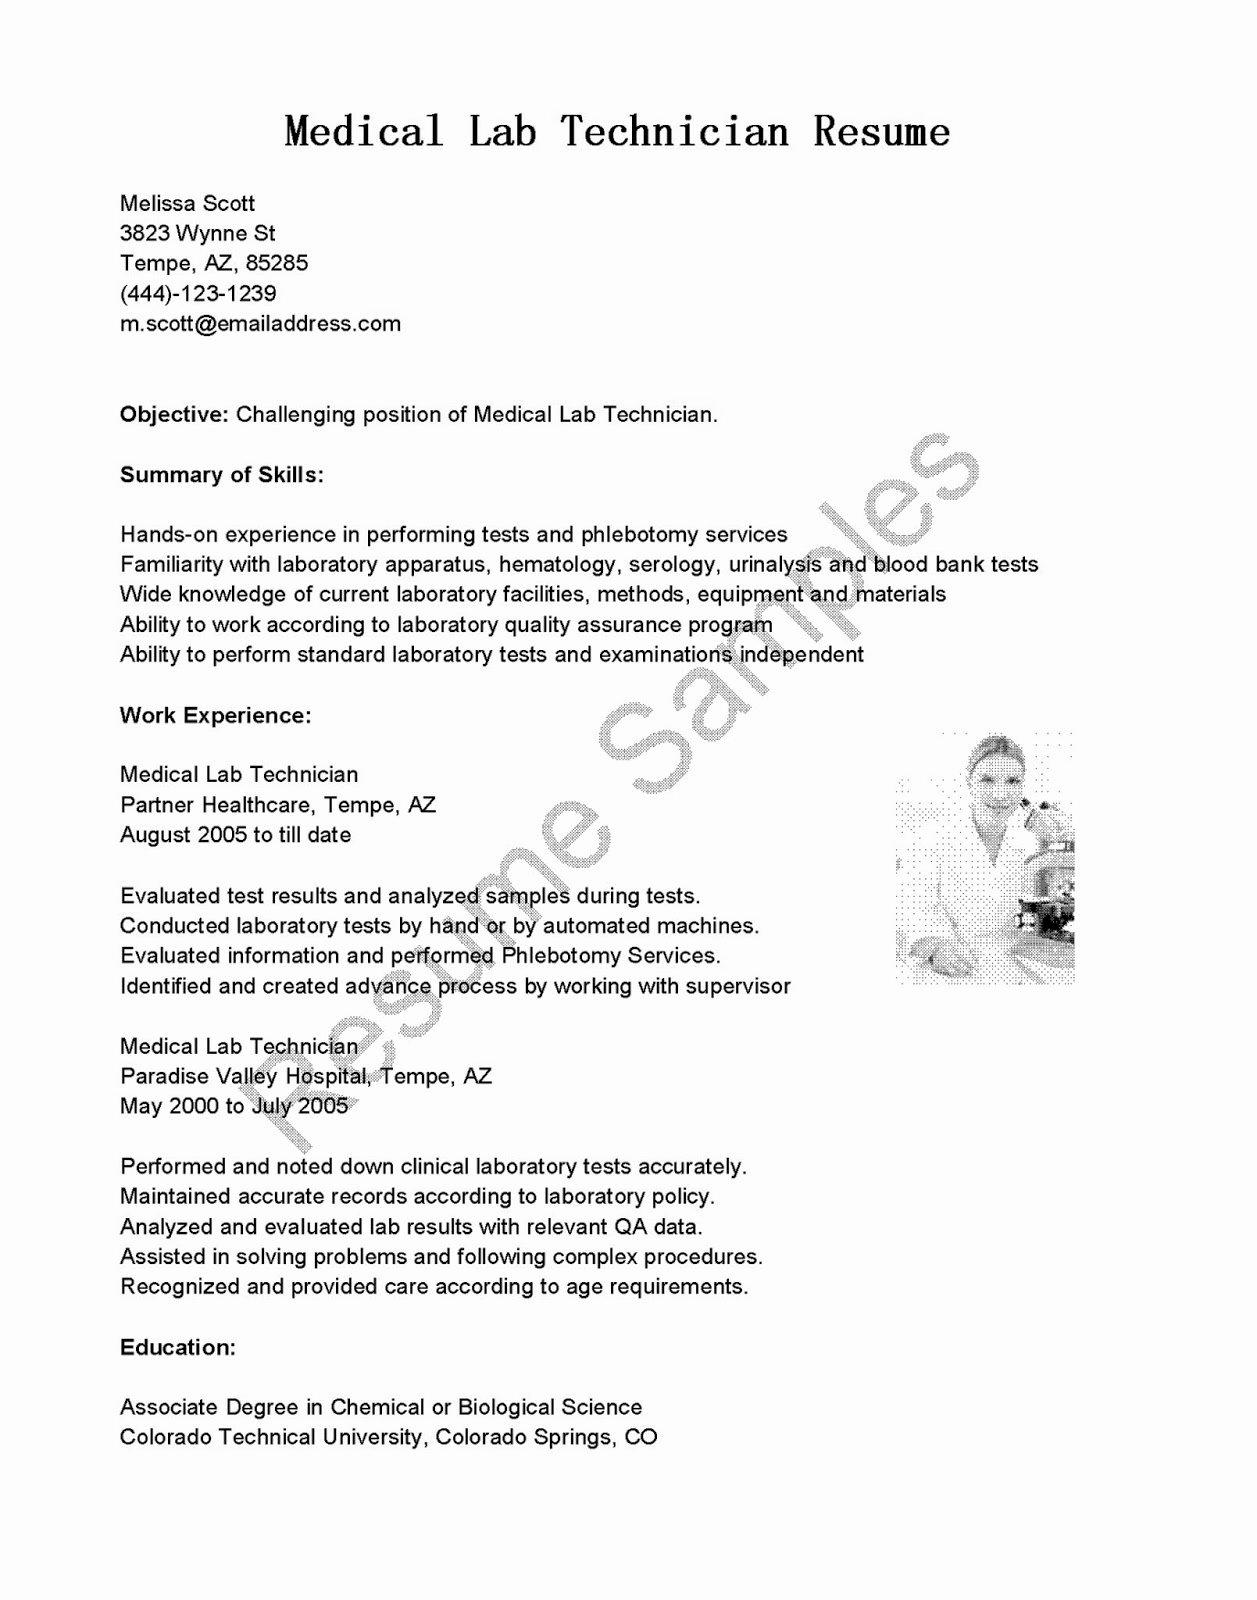 Resume Samples Medical Lab Technician Resume Sample